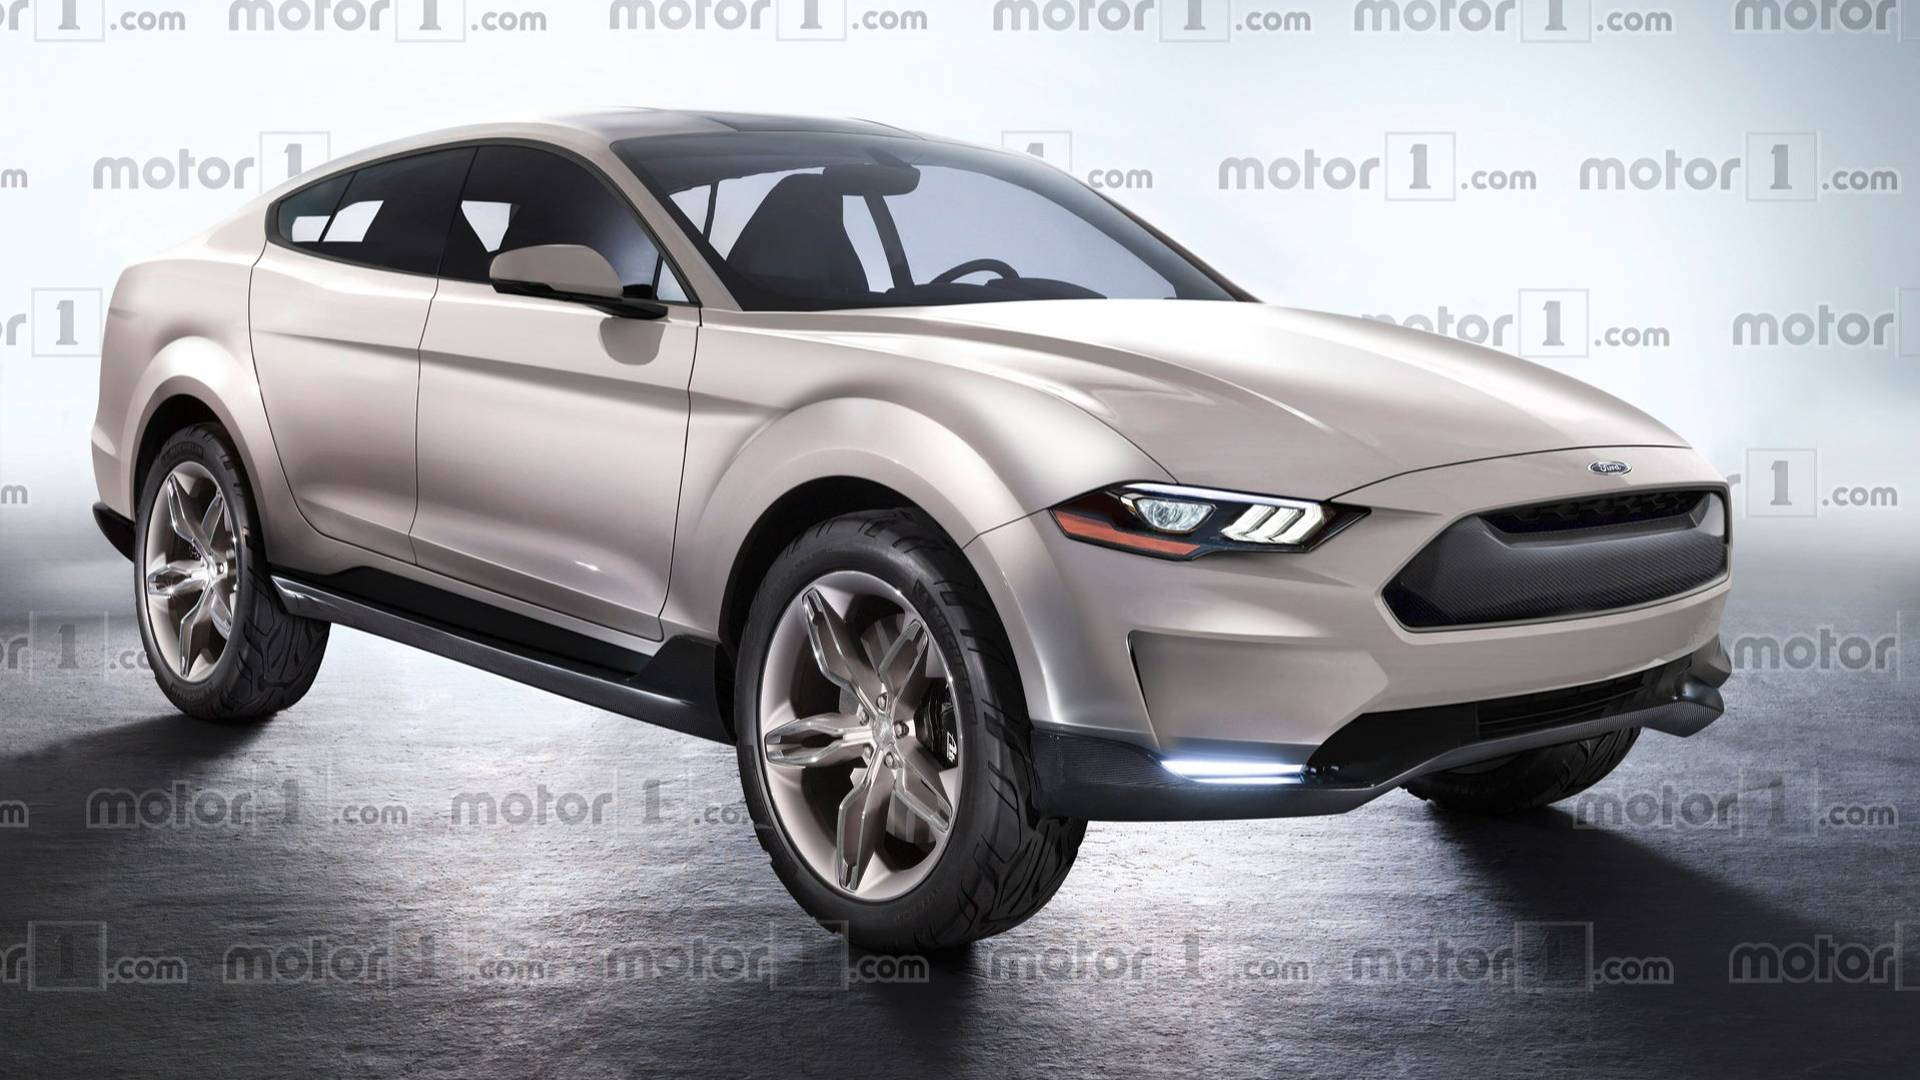 reviews review kuga car ford gear titanium suvs top